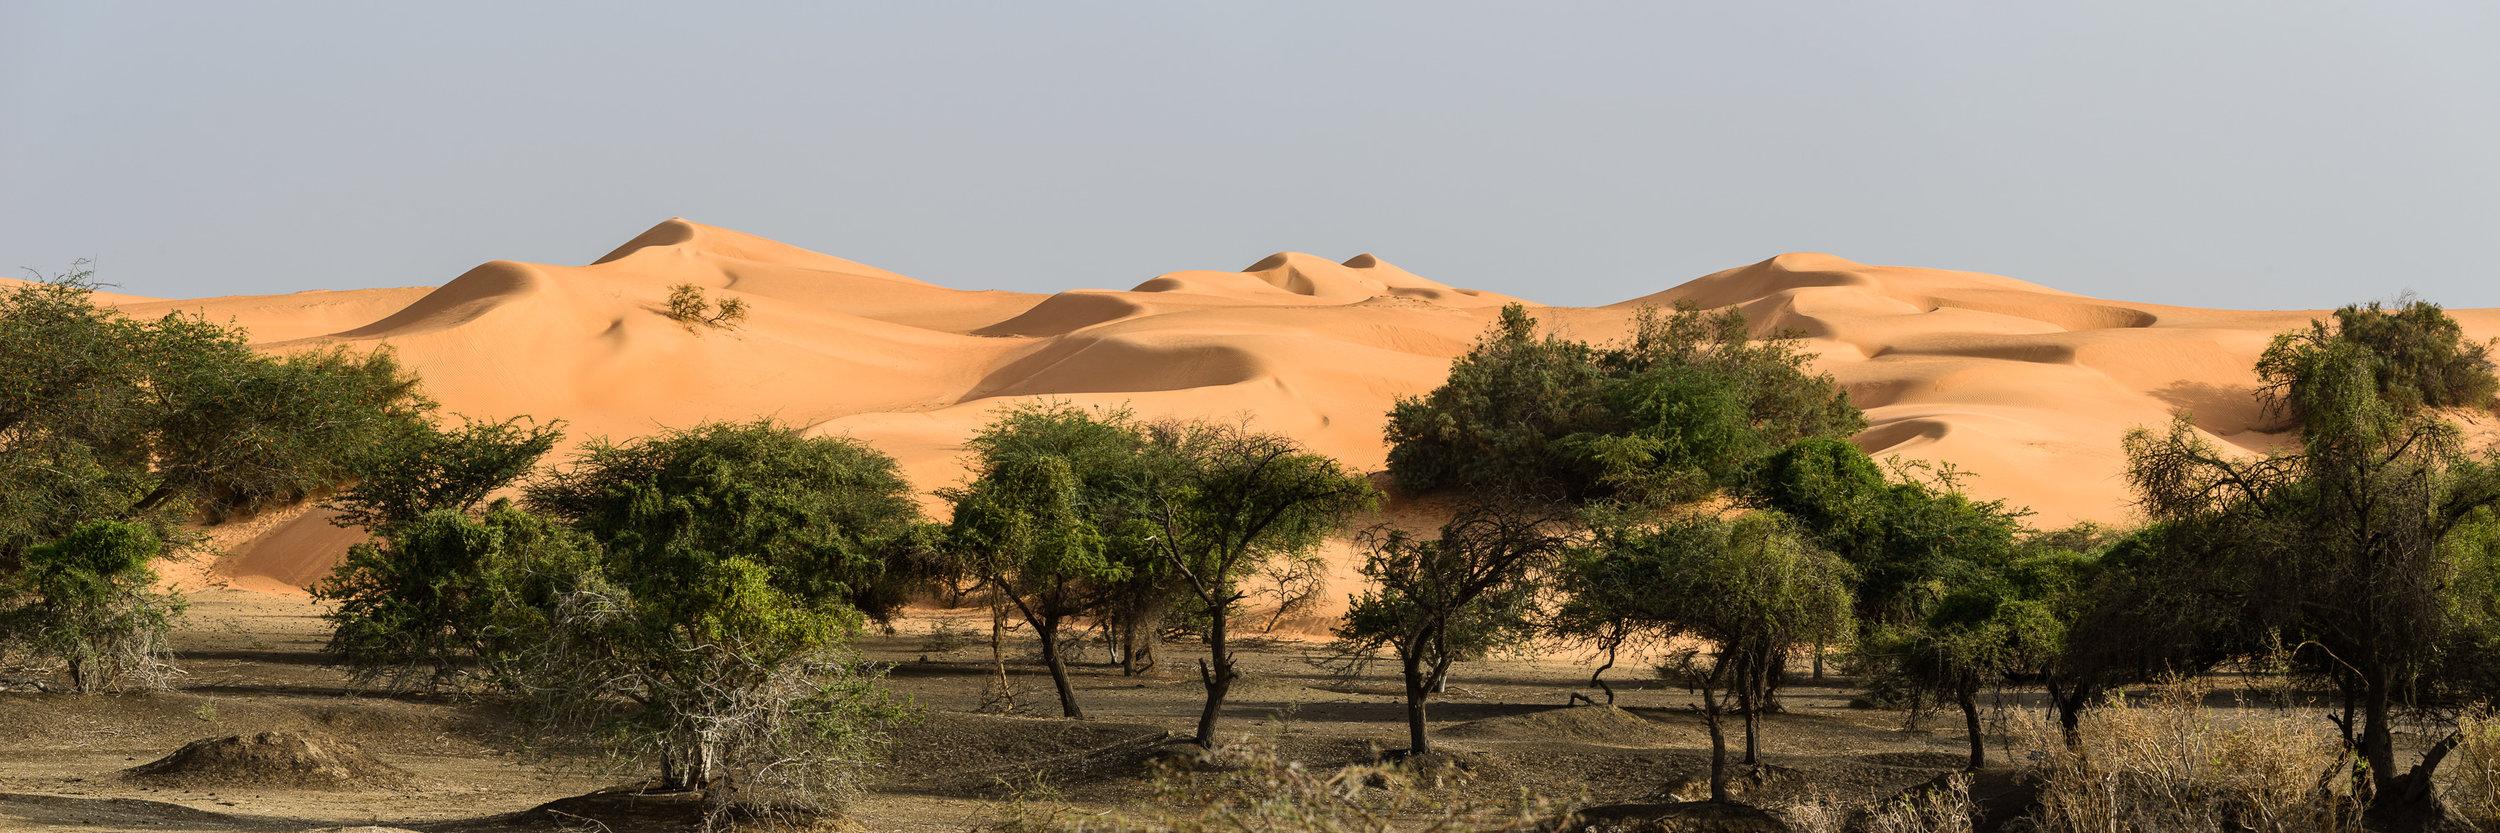 Copy of Mauritania